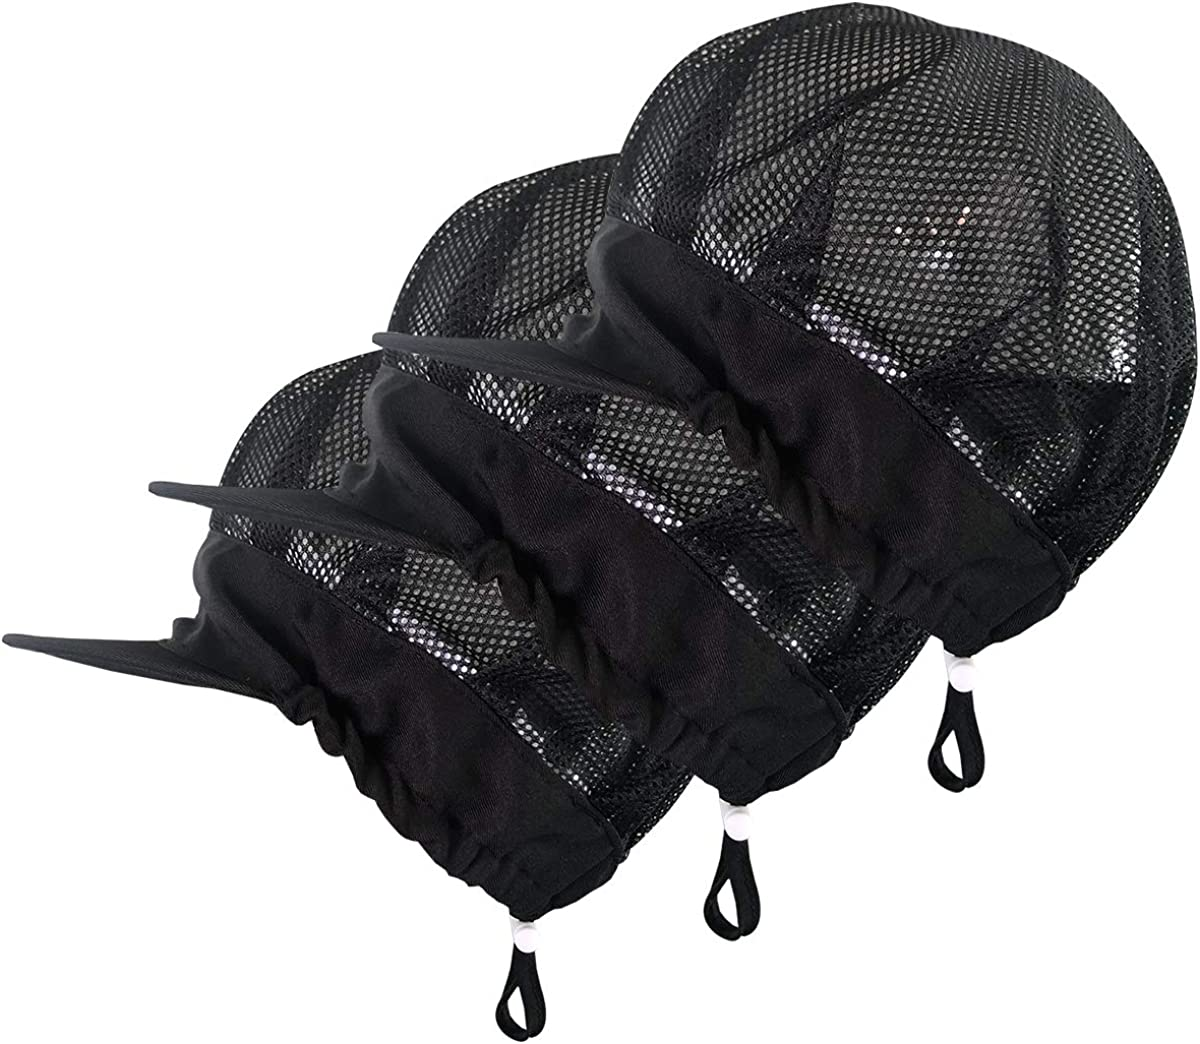 Adjustable Chef Cap Cooking Kitchen Hat Food Service Hair Nets Mesh Brim Reusable Restaurant Vent Beanie